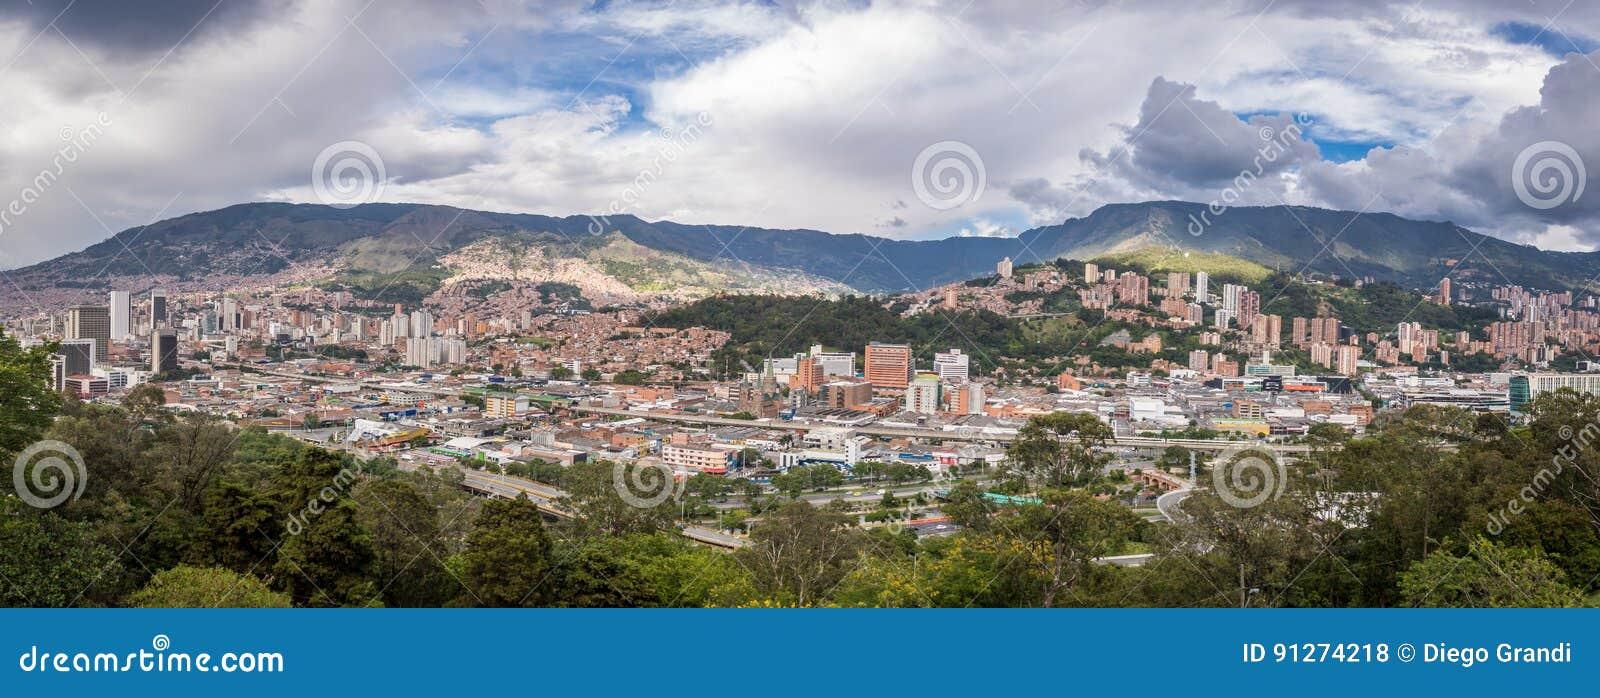 Vista panorâmica de Medellin, Colômbia